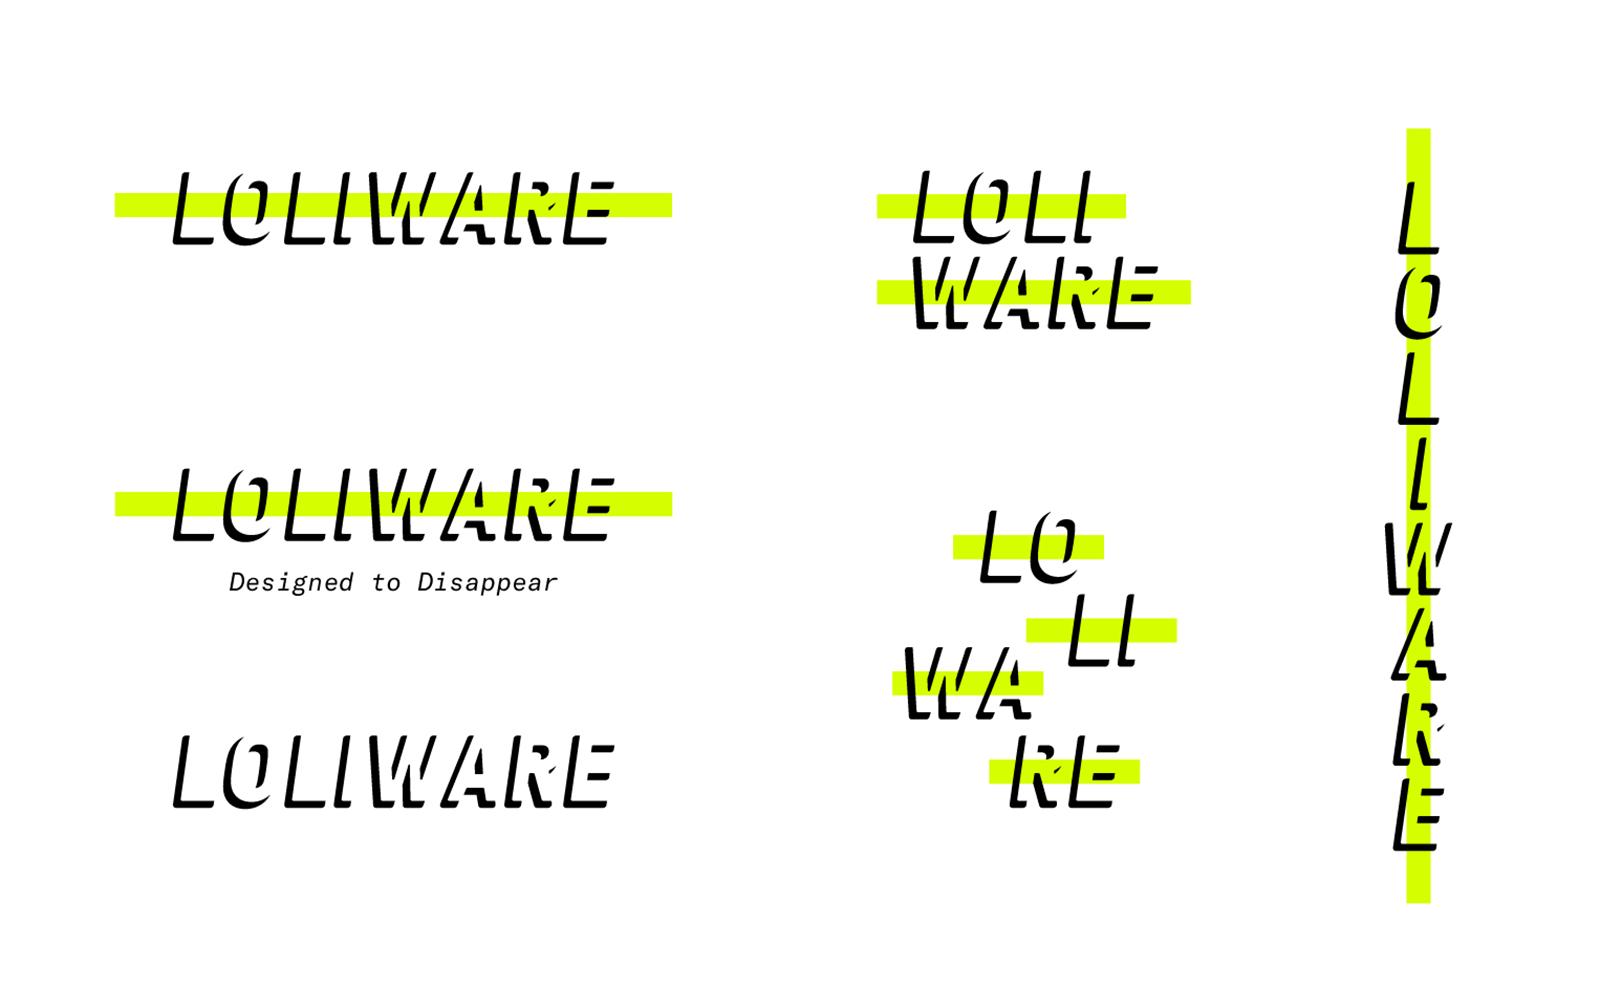 Loliware手机品牌启用全新的品牌VI形象设计-深圳VI设计2